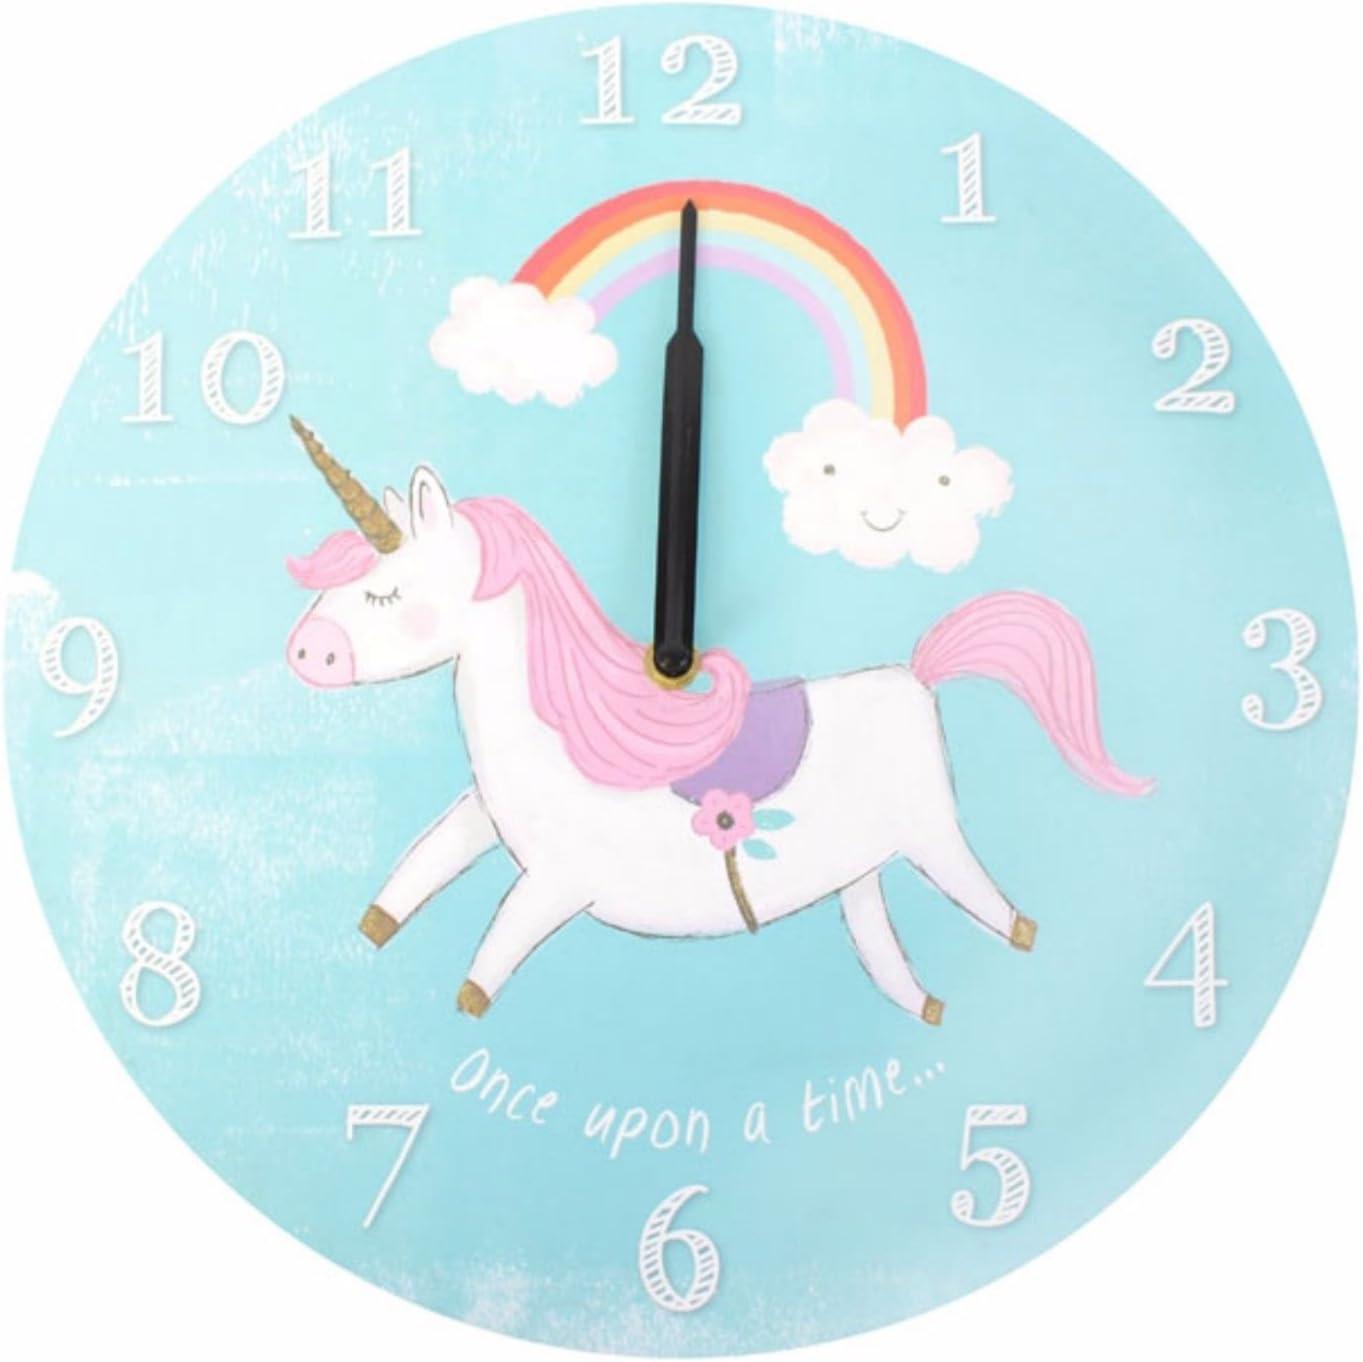 Horloge murale pour enfant rond Licorne Horloge Horloge murale /à piles